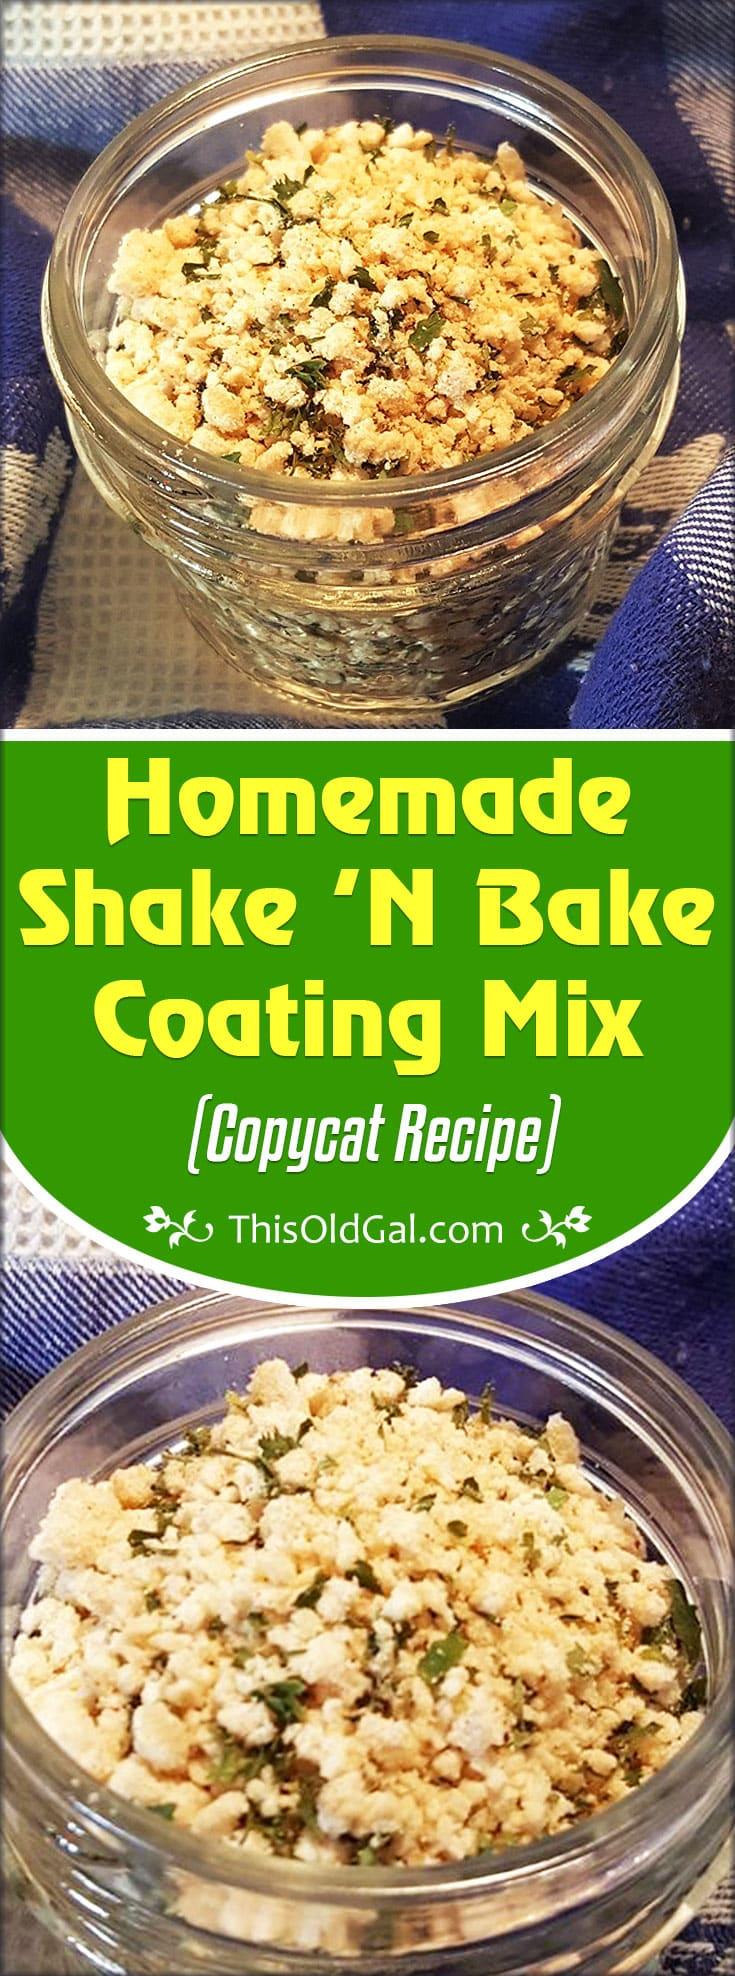 Homemade Shake 'N Bake Coating Mix (Copycat Recipe)